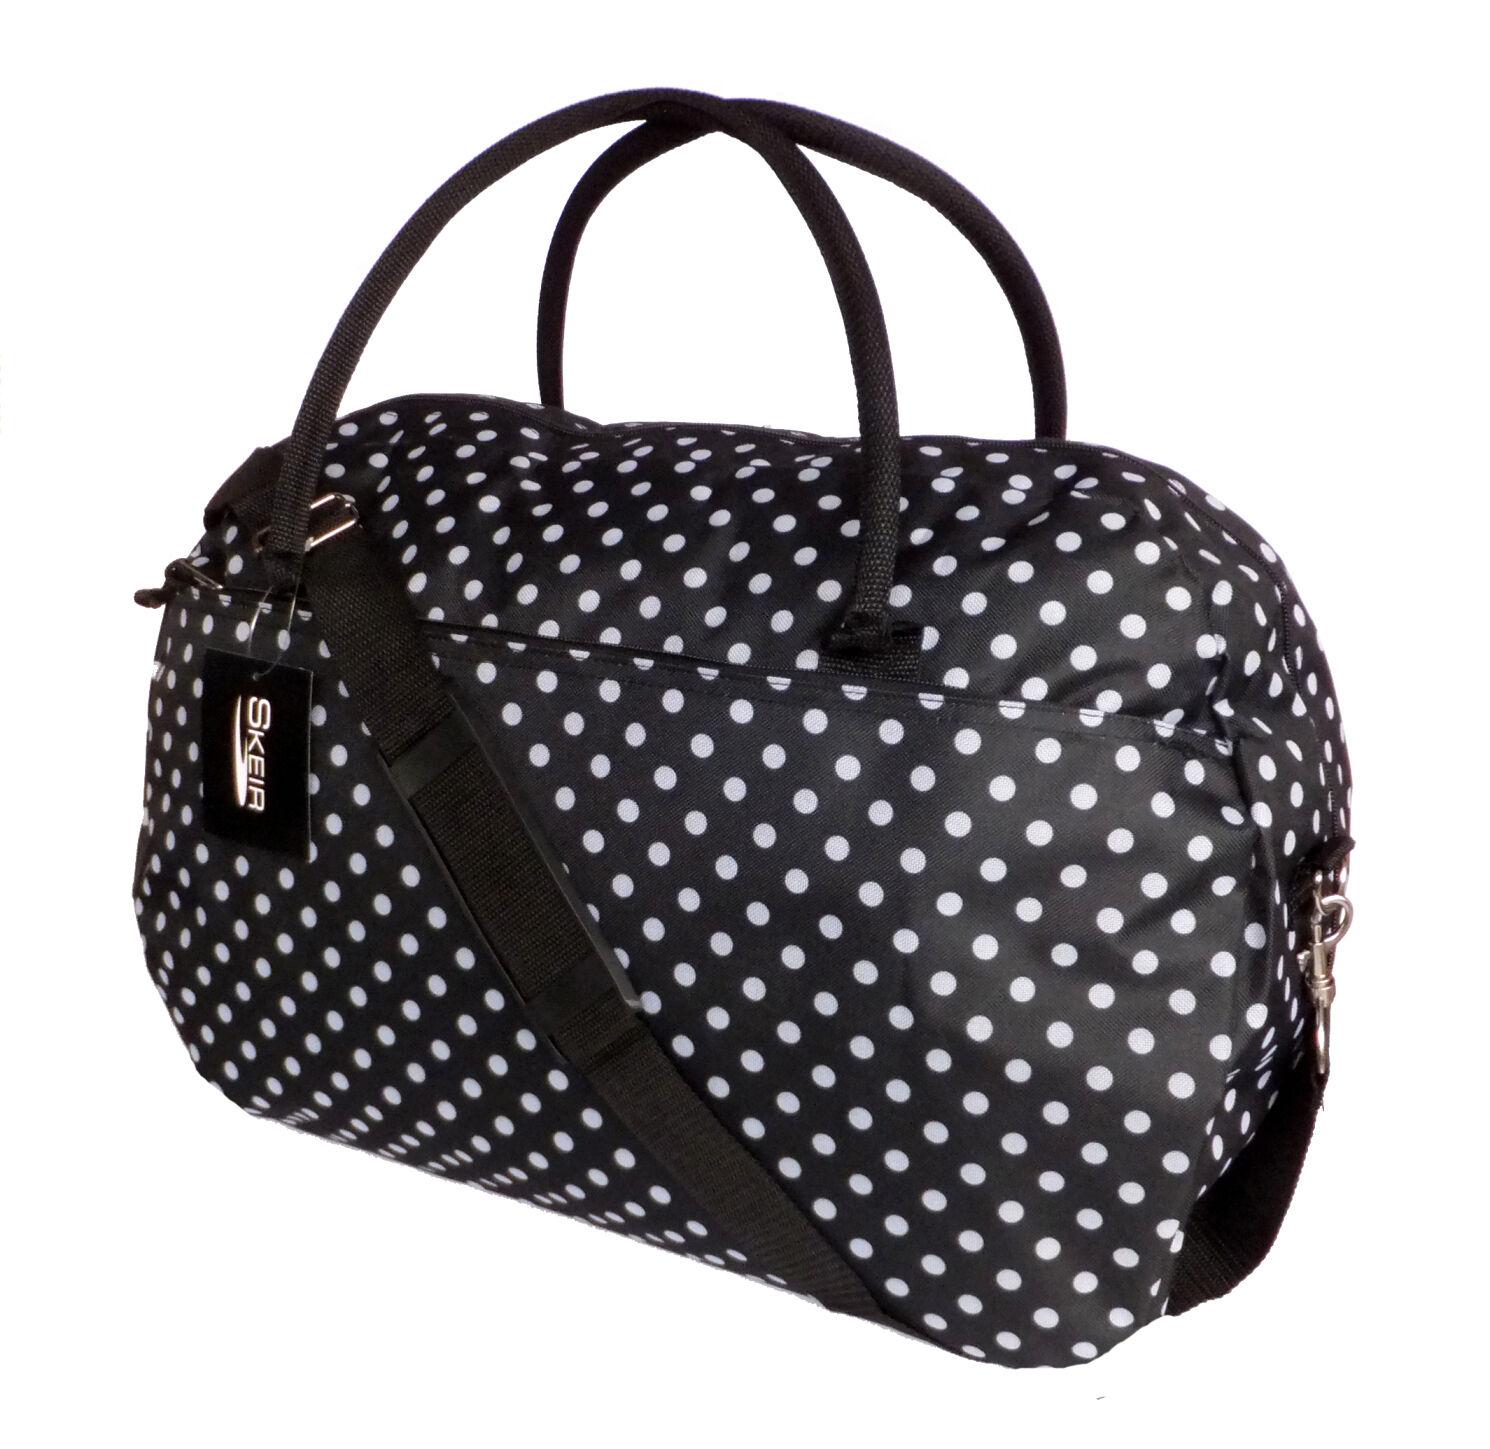 Popular Womenu0026#39;s Polka Dot Weekender Handbag - Navy // Target $24.49 // Super Cute Overnight Bag! | Misc ...